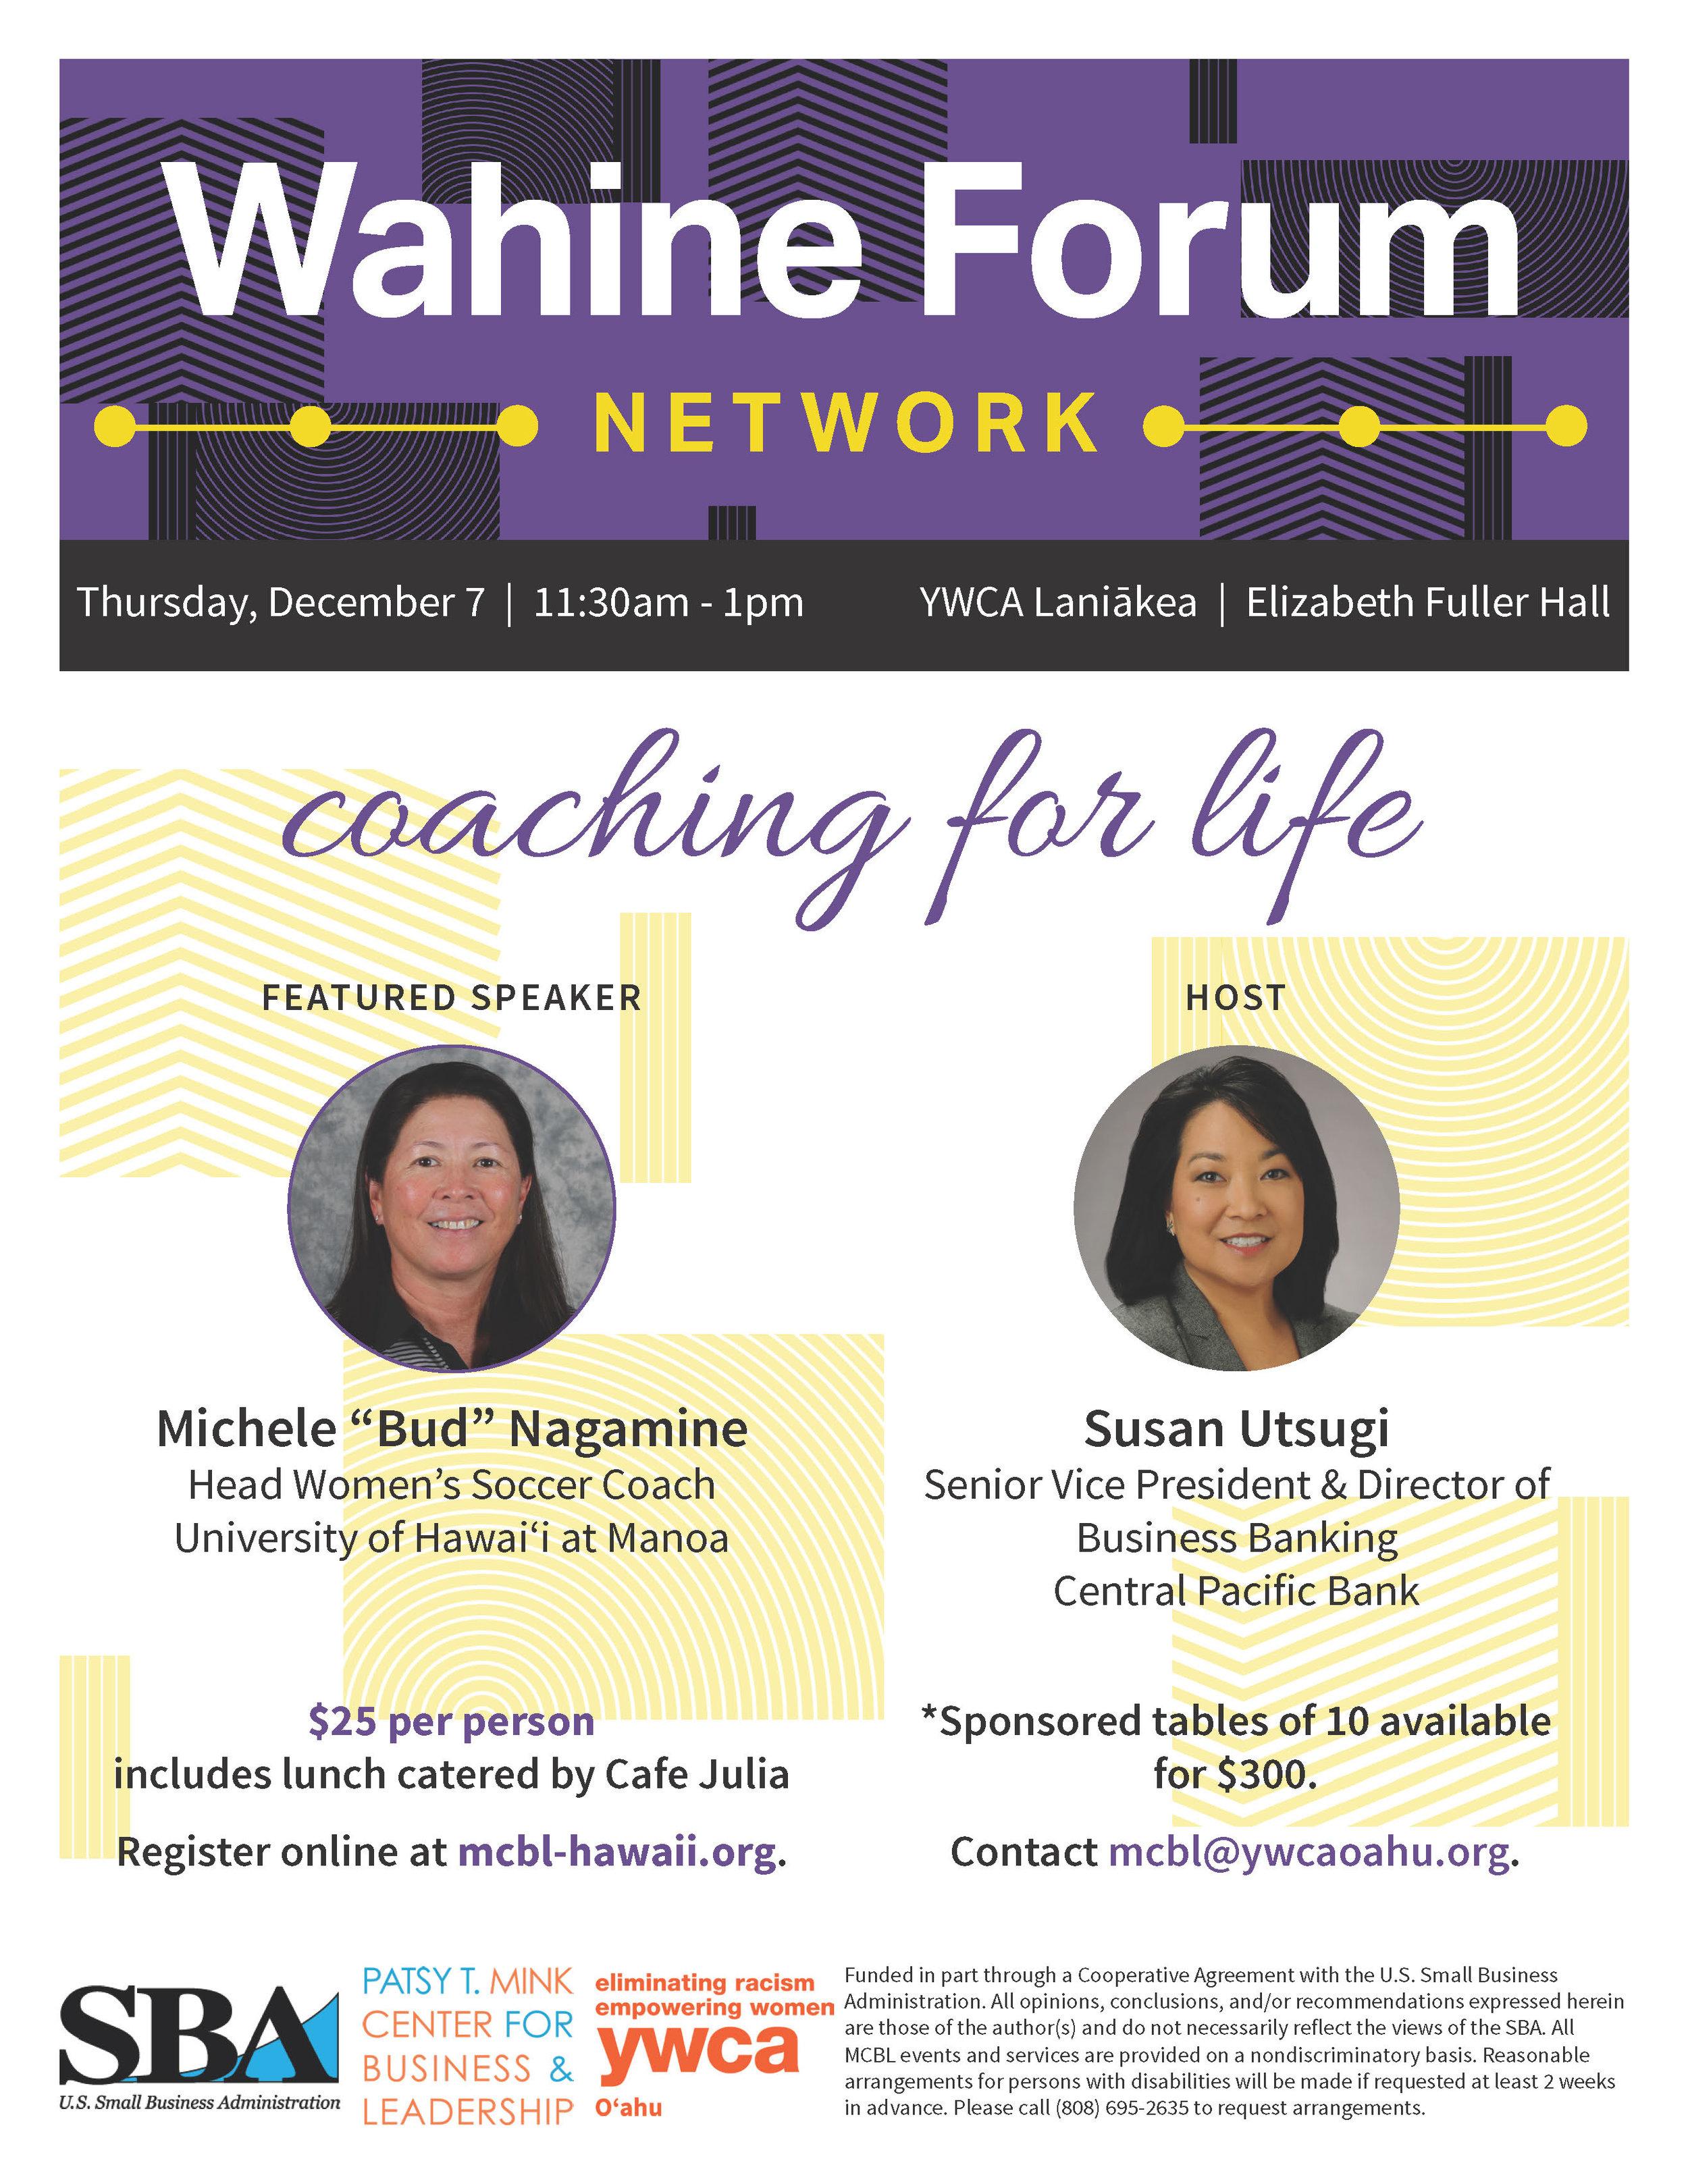 Wahine Forum Network - Coaching for Life.jpg